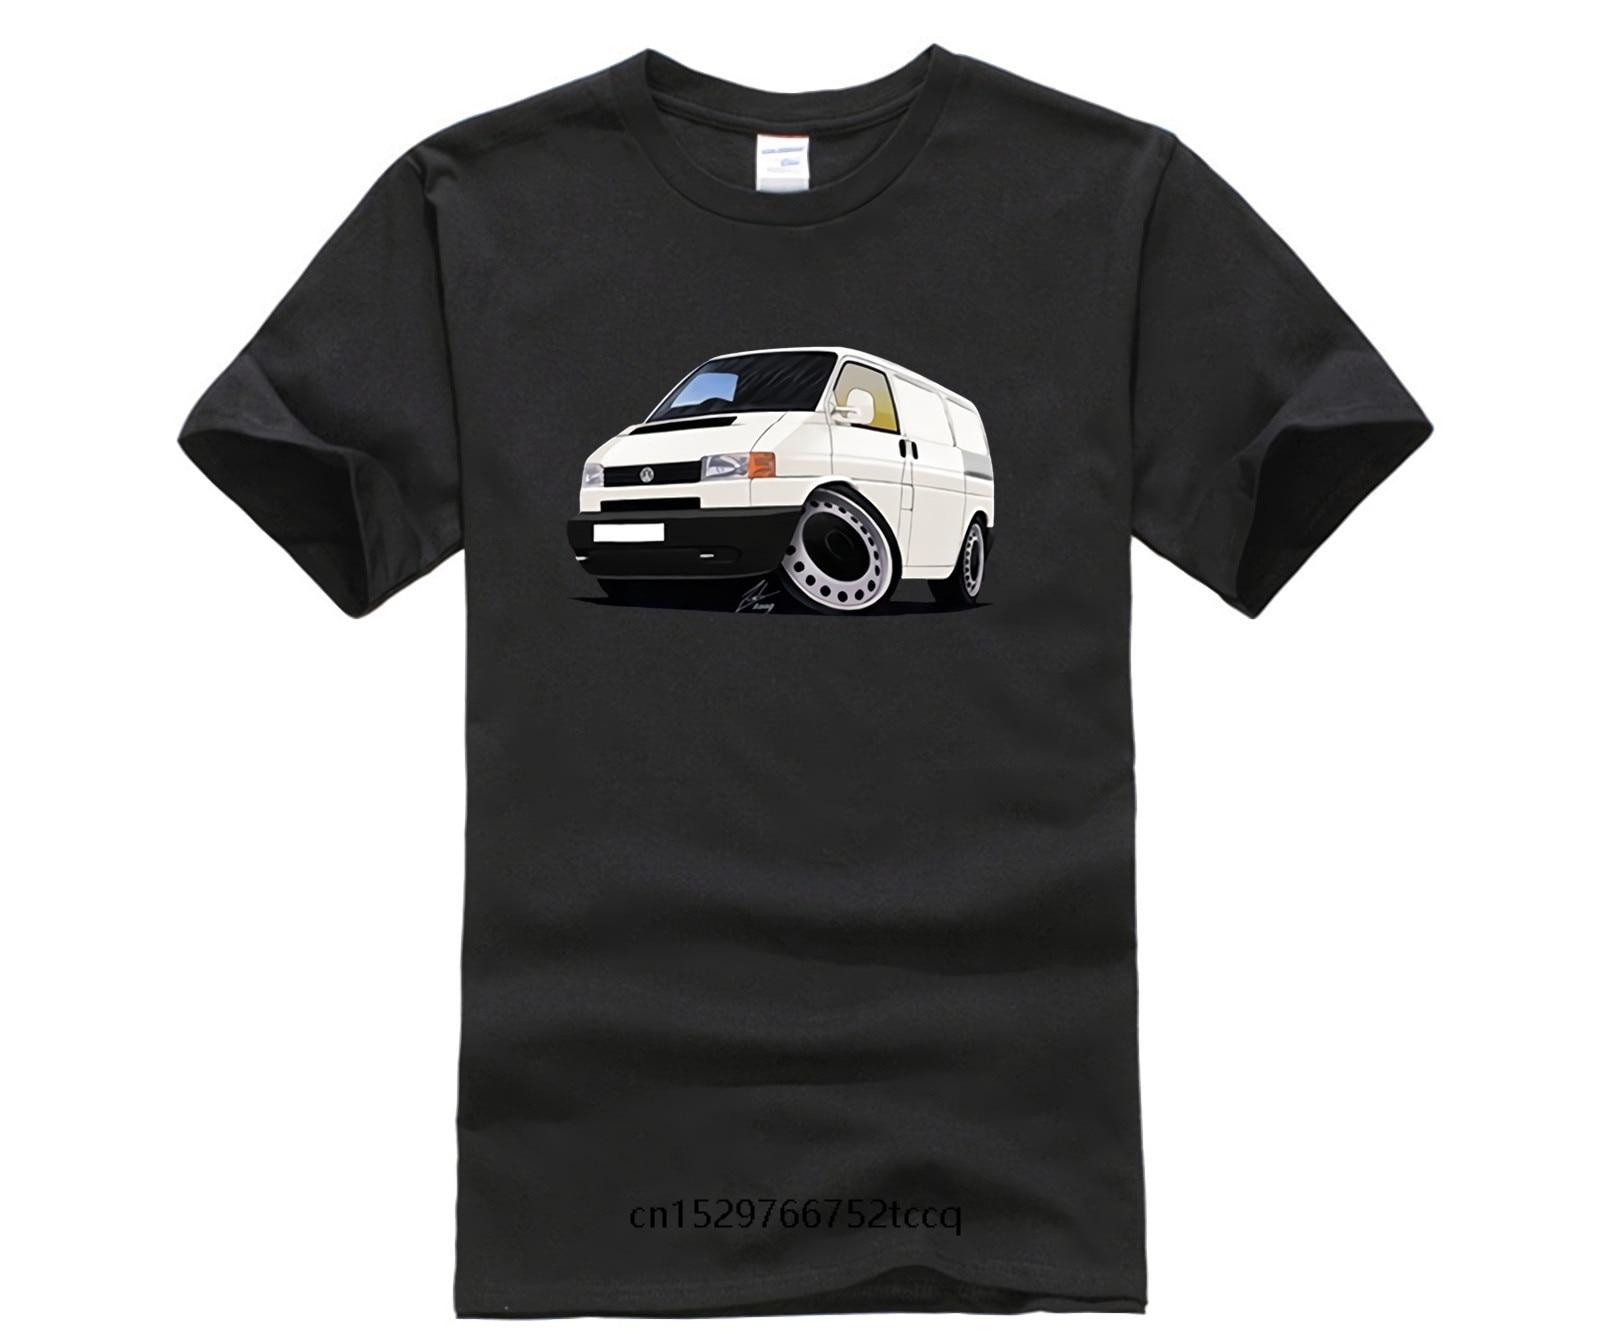 Mens Summer Shirts Short Sleeve Volkswagen T4 Transporter Mens Round Collar Short Sleeve Cheap Homme Cool Tshirt